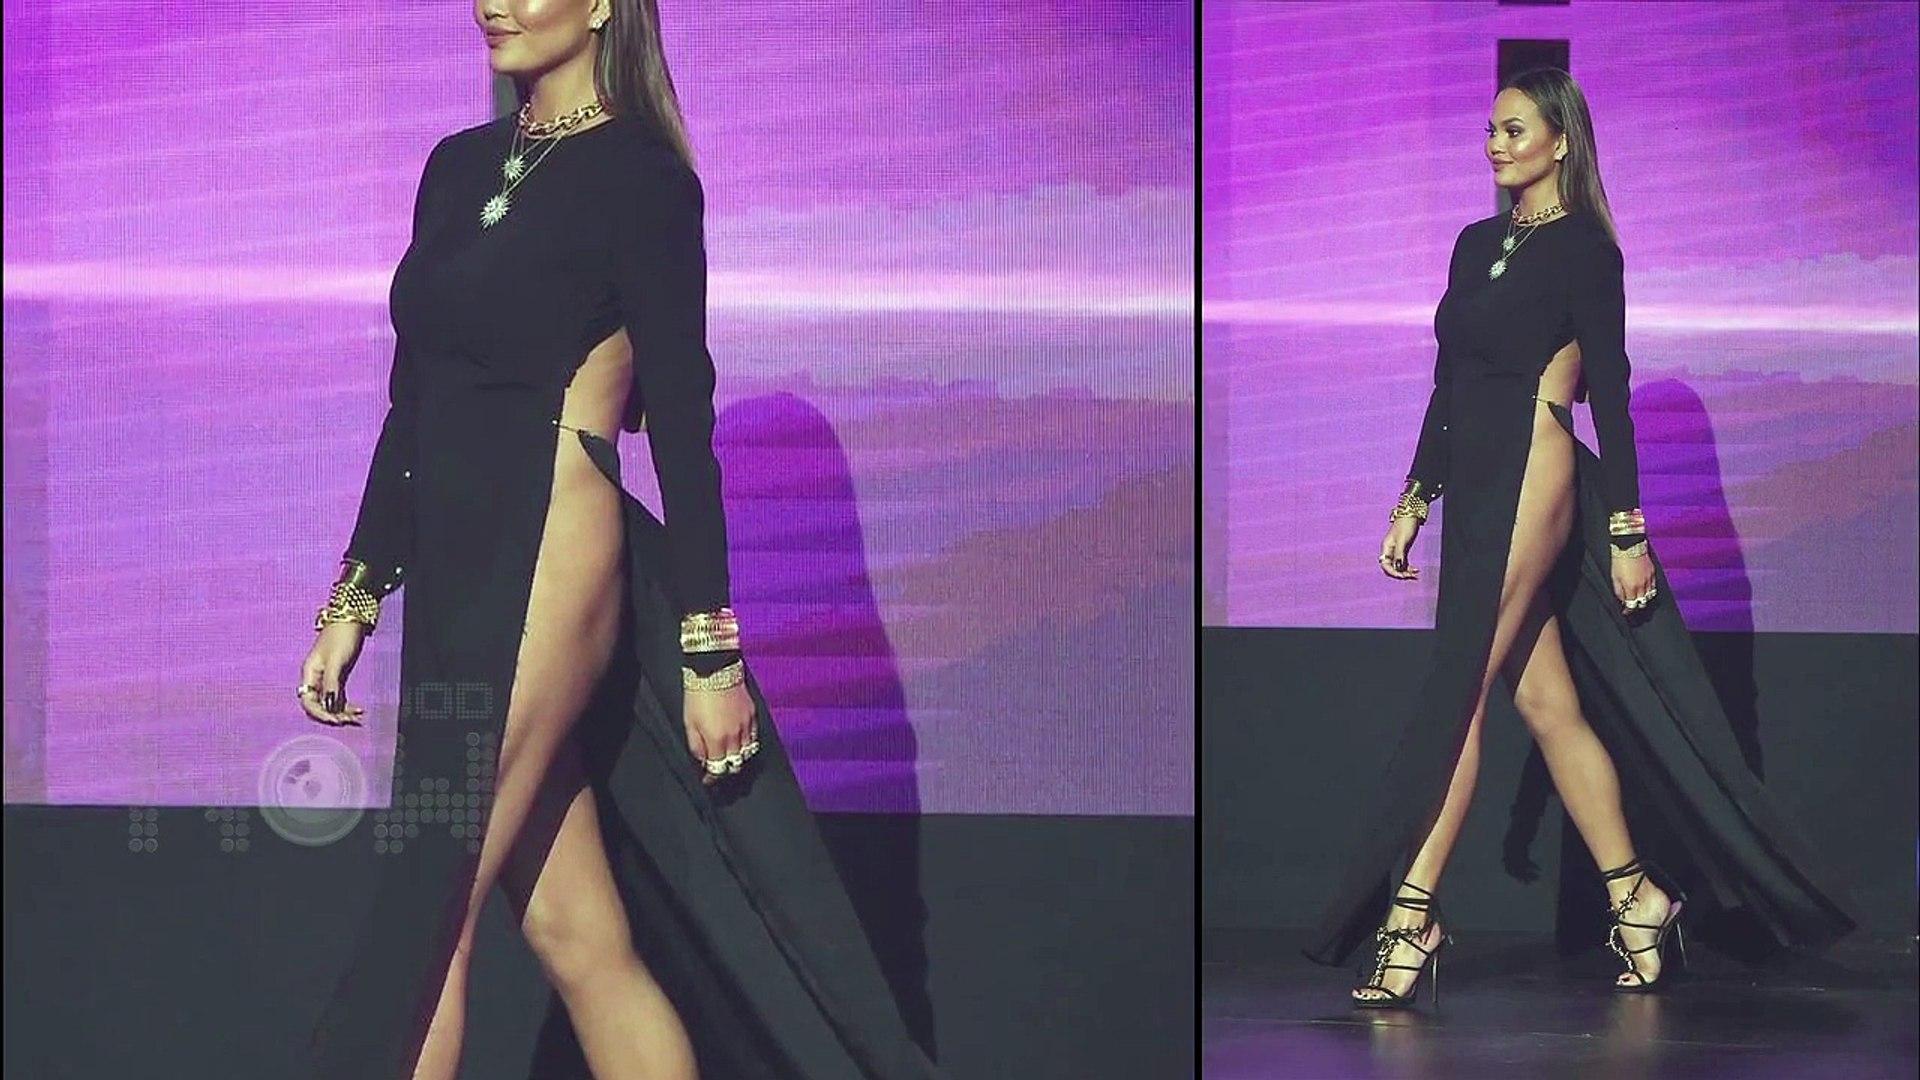 Chrissy Teigen Shocking Wardrobe Malfunction At Ama 2016 Video Dailymotion